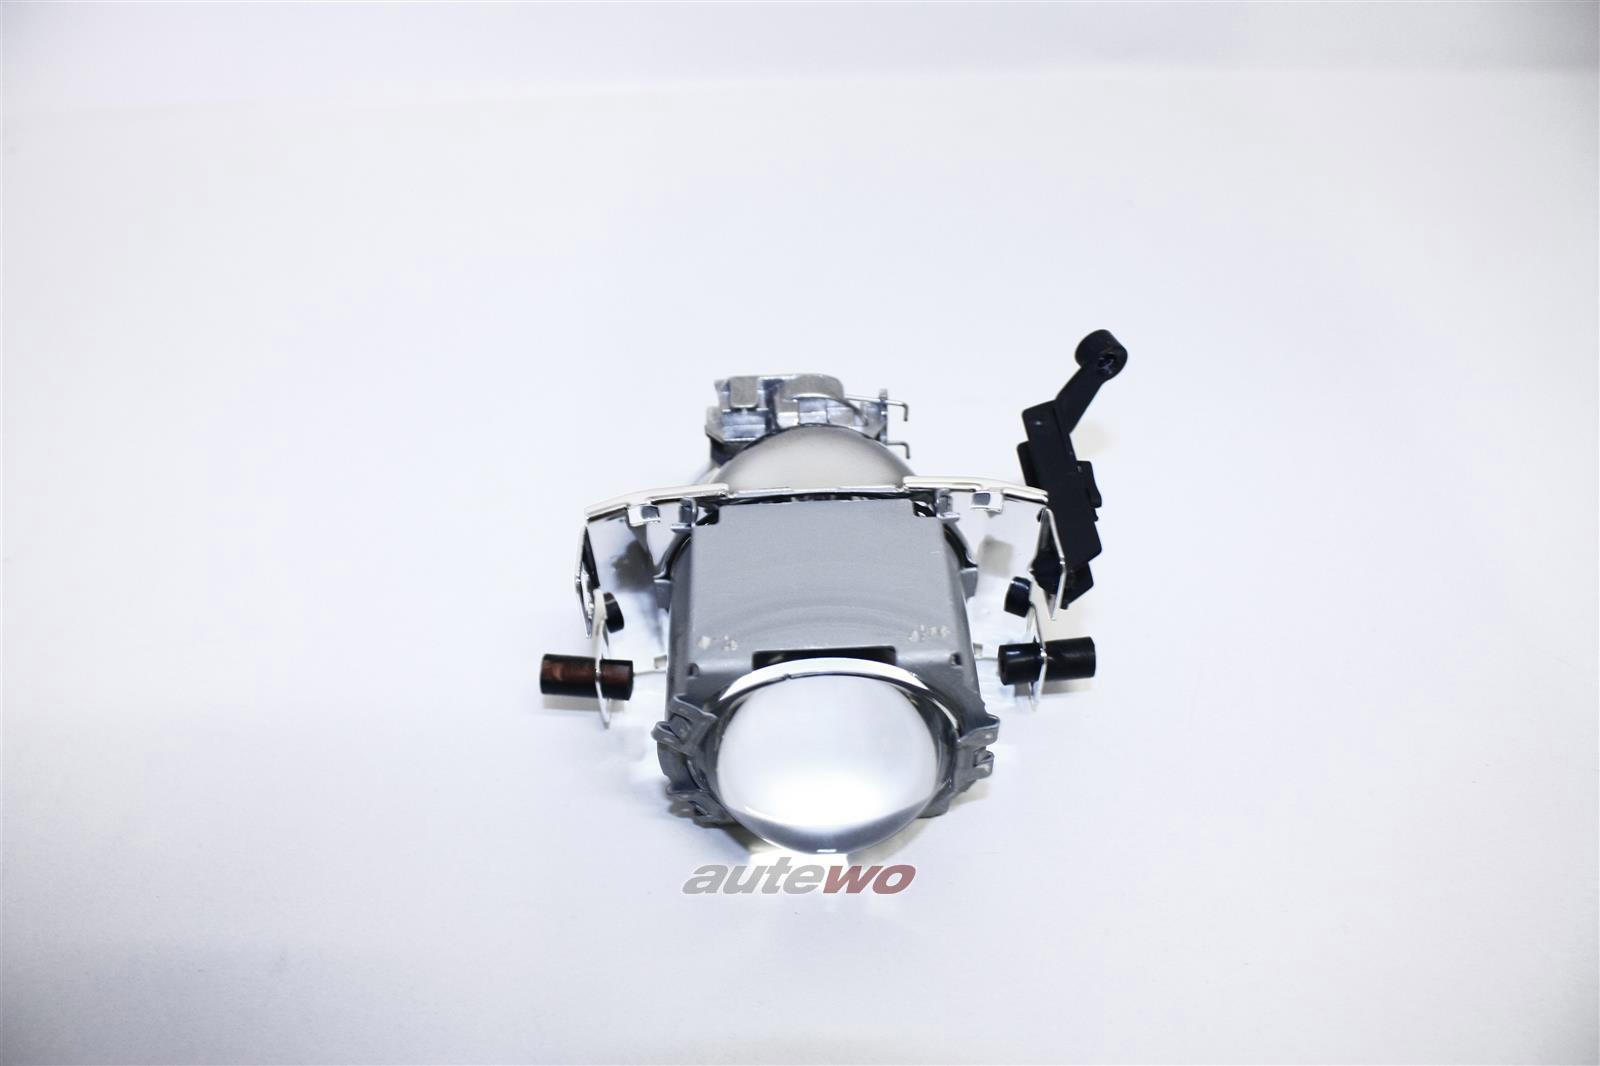 895941727 NEU Audi 80 B4/Coupe/Cabrio Typ 89/S2 Reflektor Nebelscheinwerfer